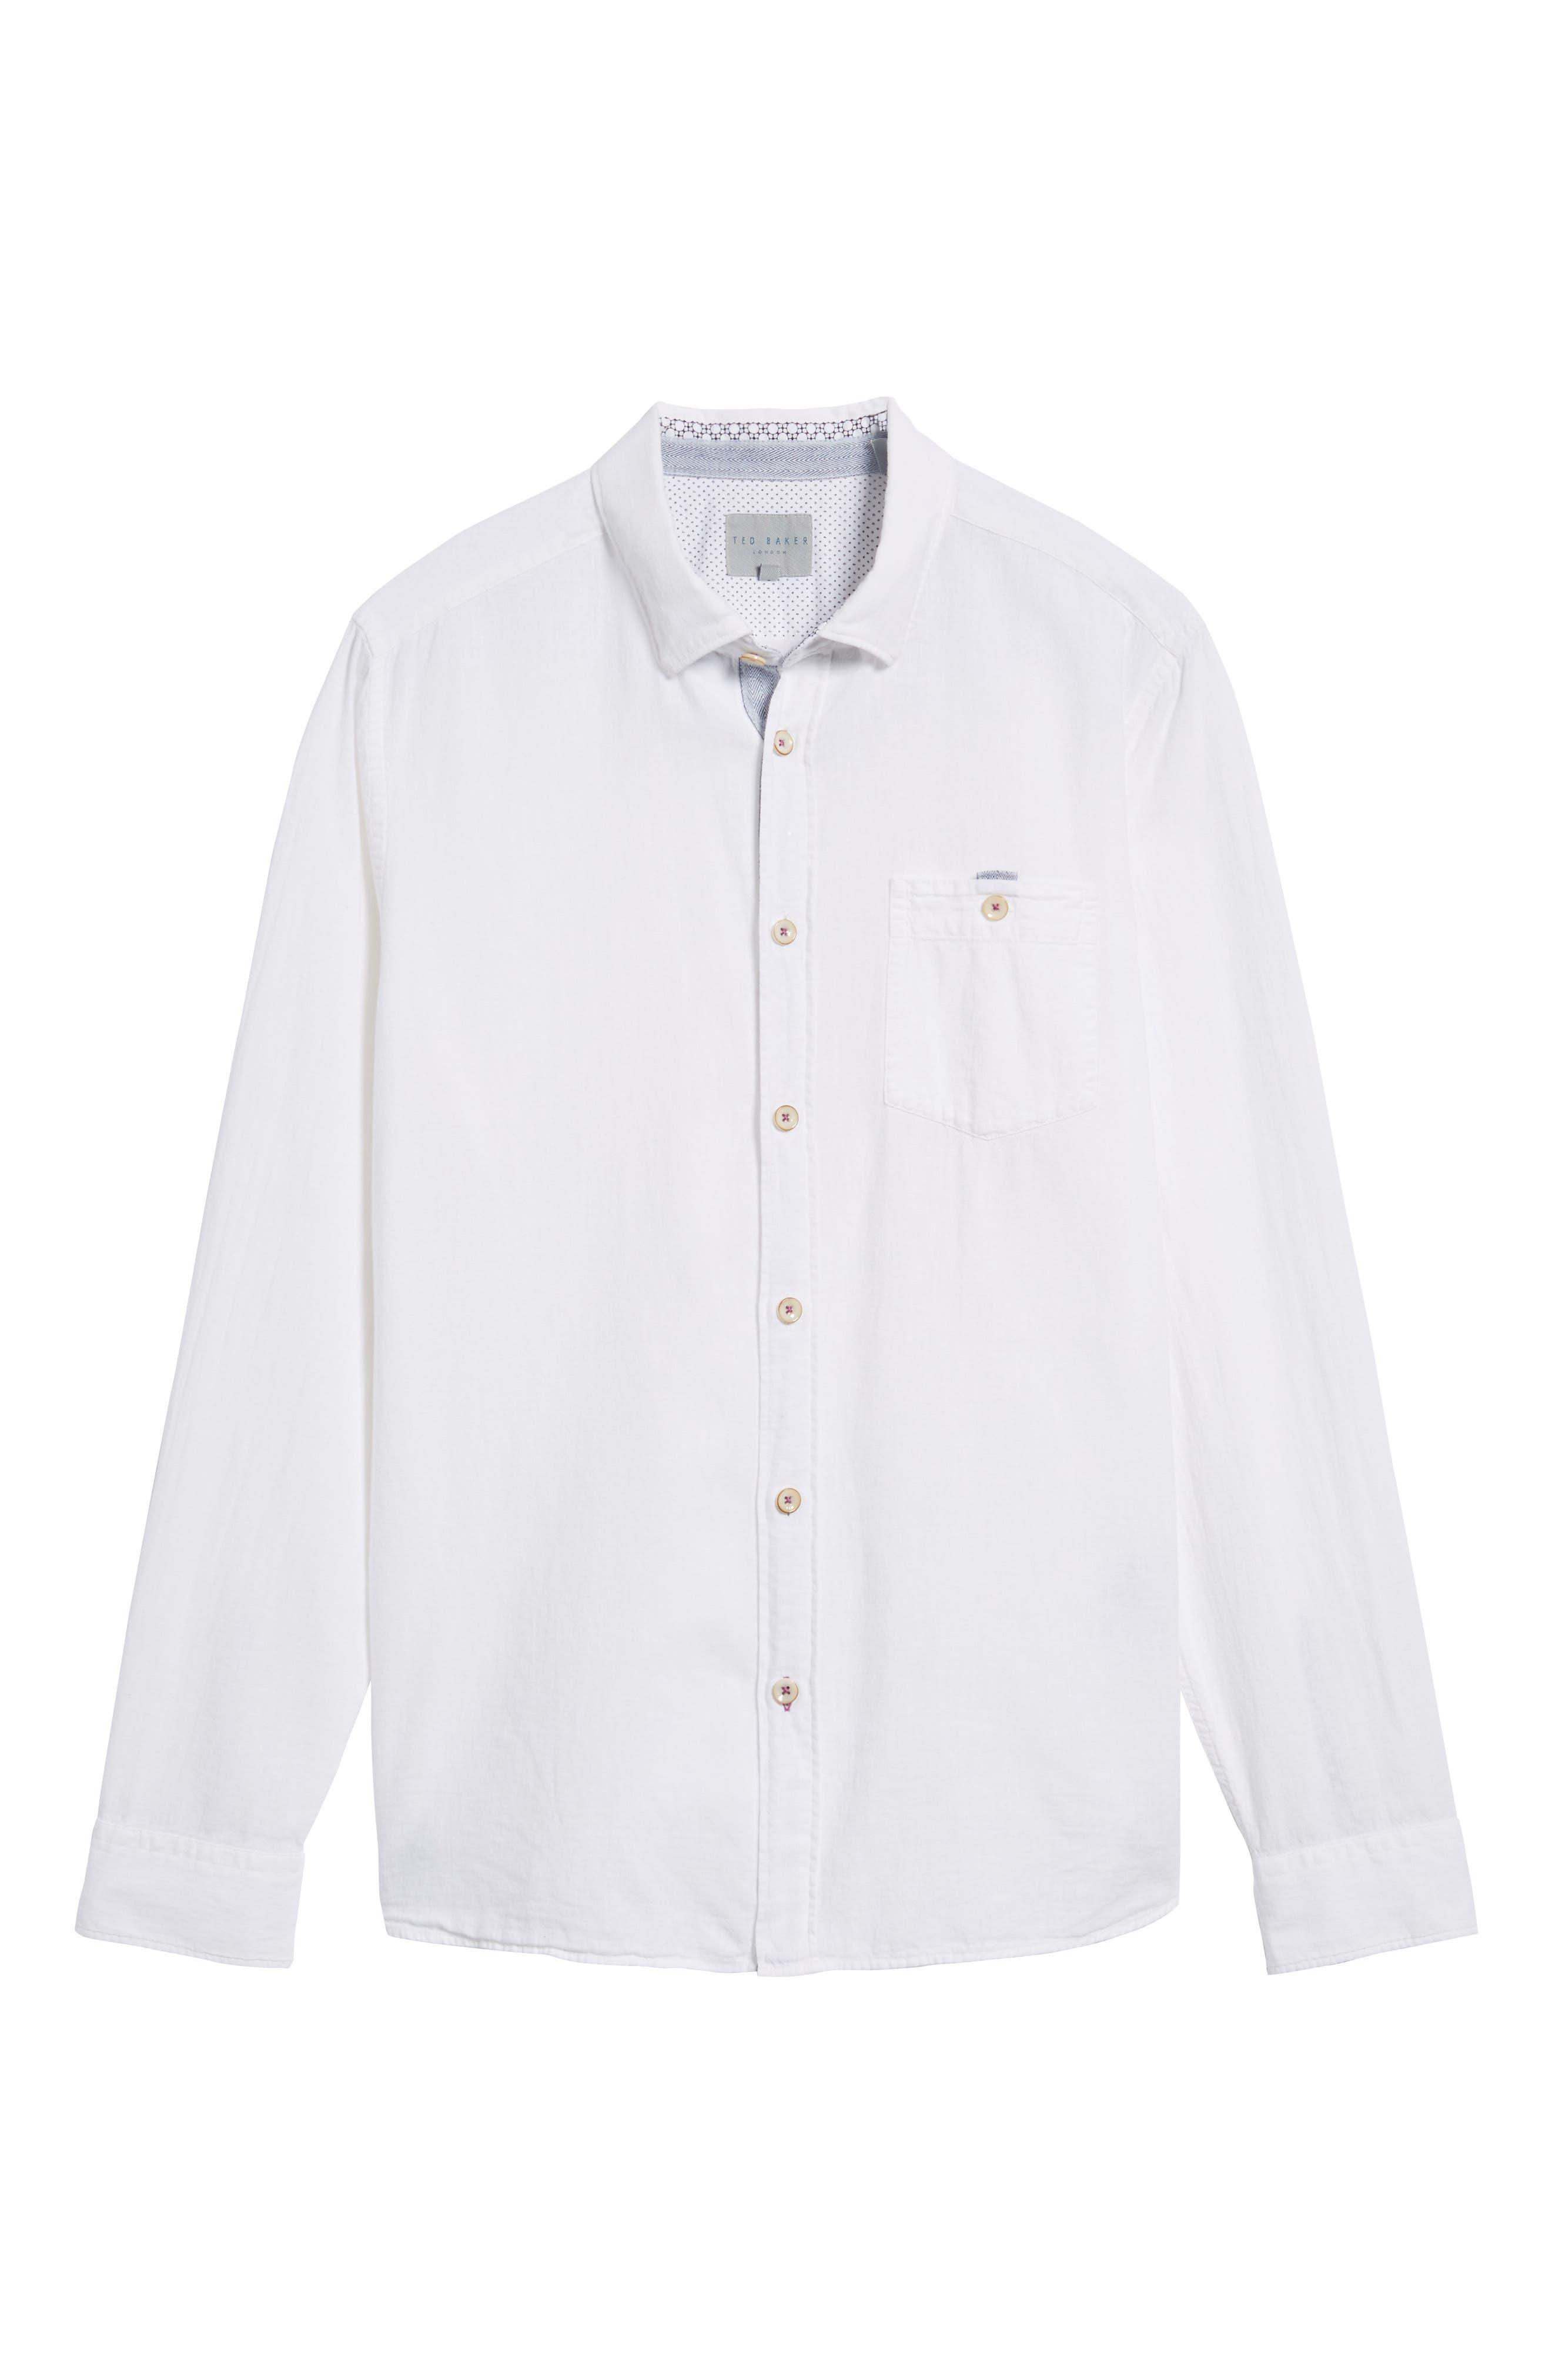 Carwash Modern Slim Fit Sport Shirt,                             Alternate thumbnail 16, color,